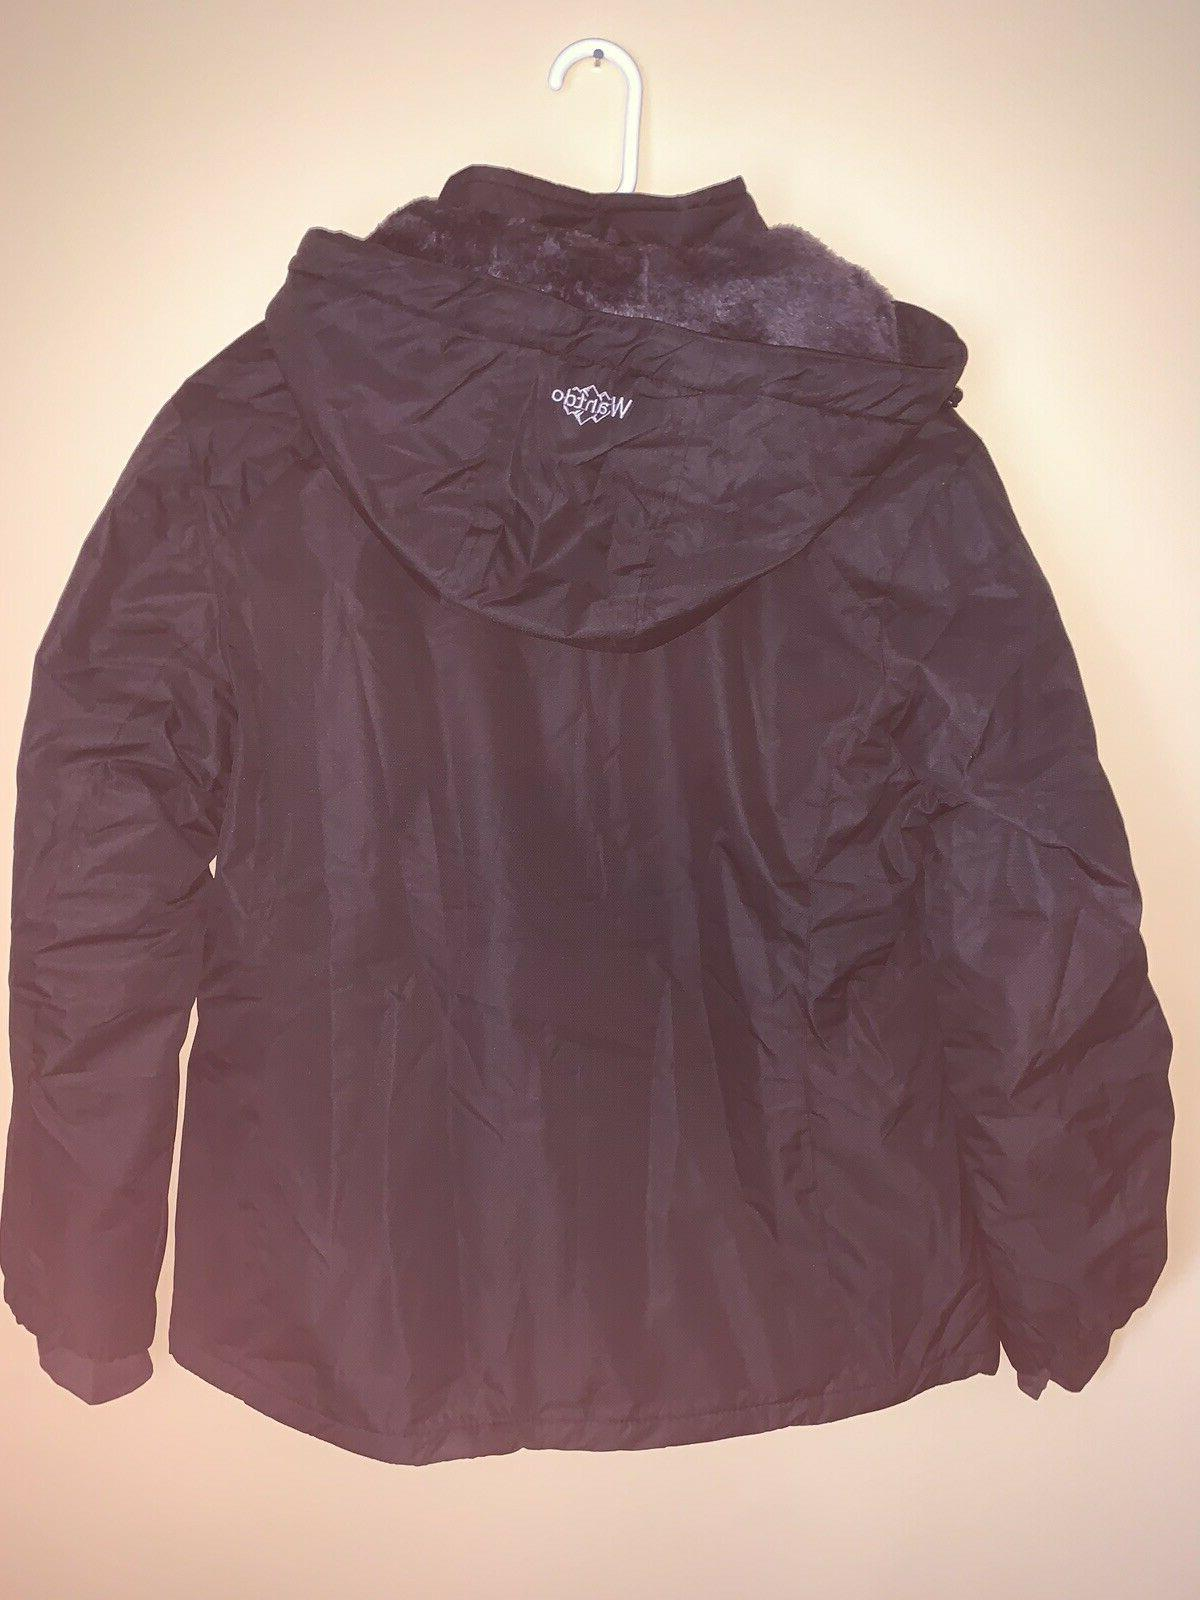 NWT Waterproof Ski Jacket Windproof Parka Coat Black